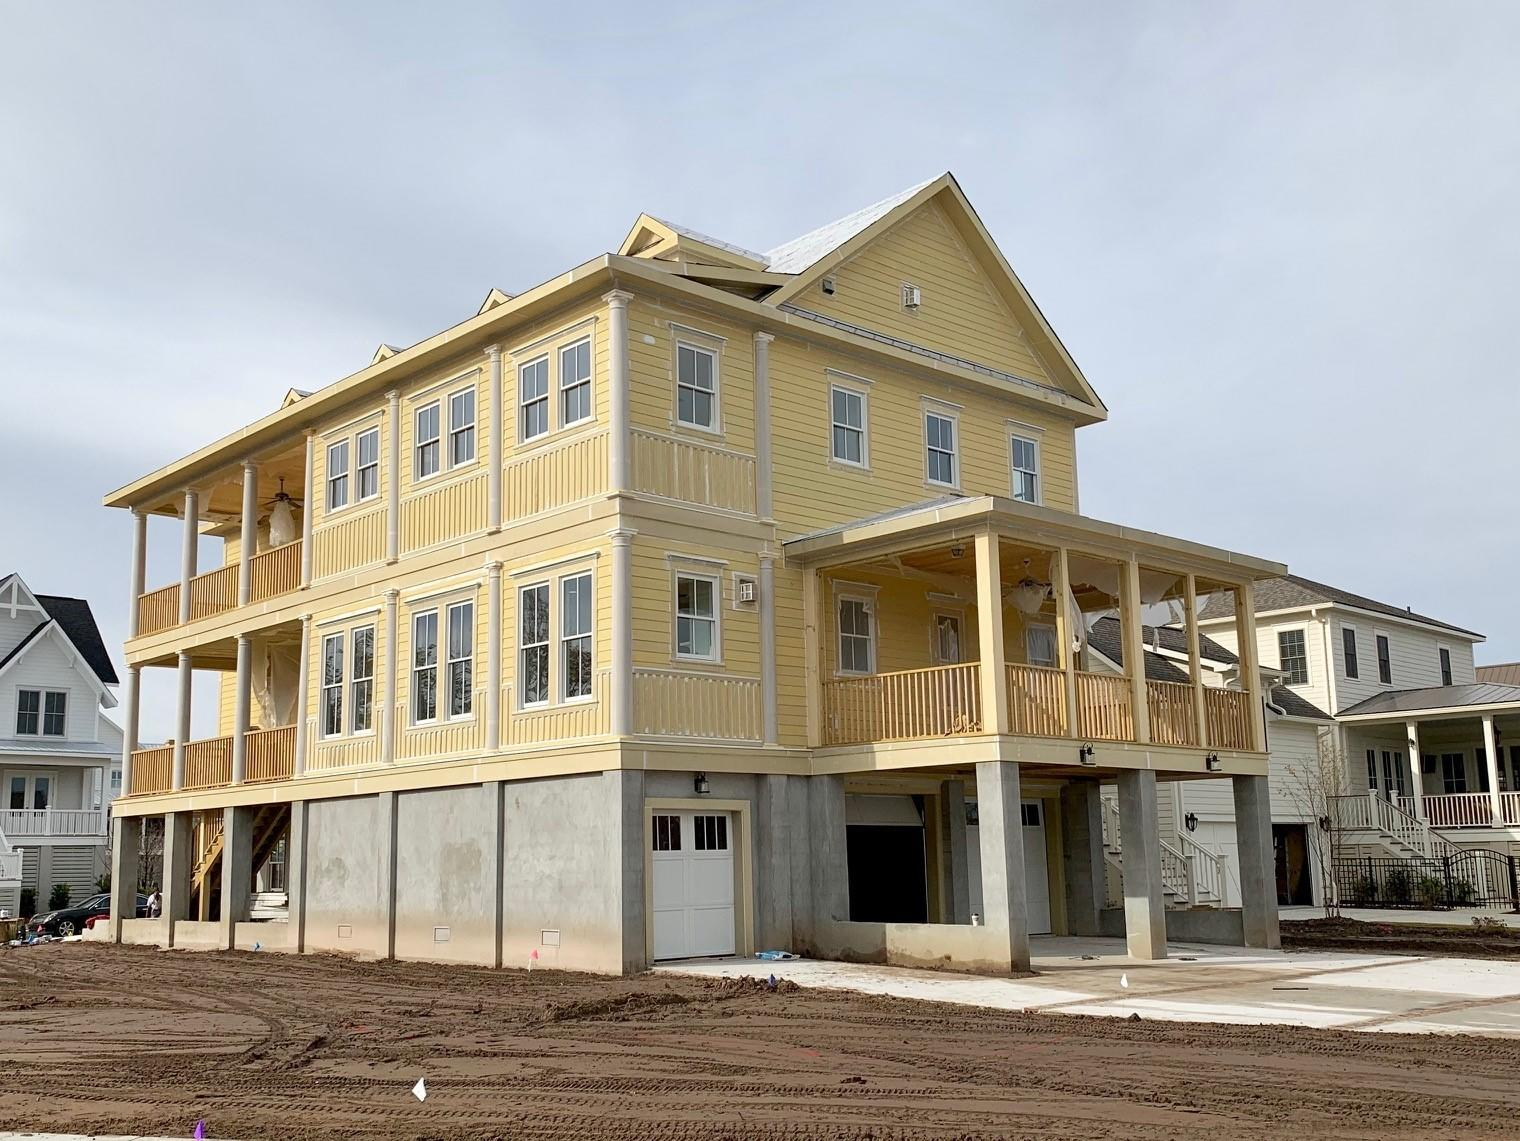 Daniel Island Homes For Sale - 206 Foundry, Charleston, SC - 6